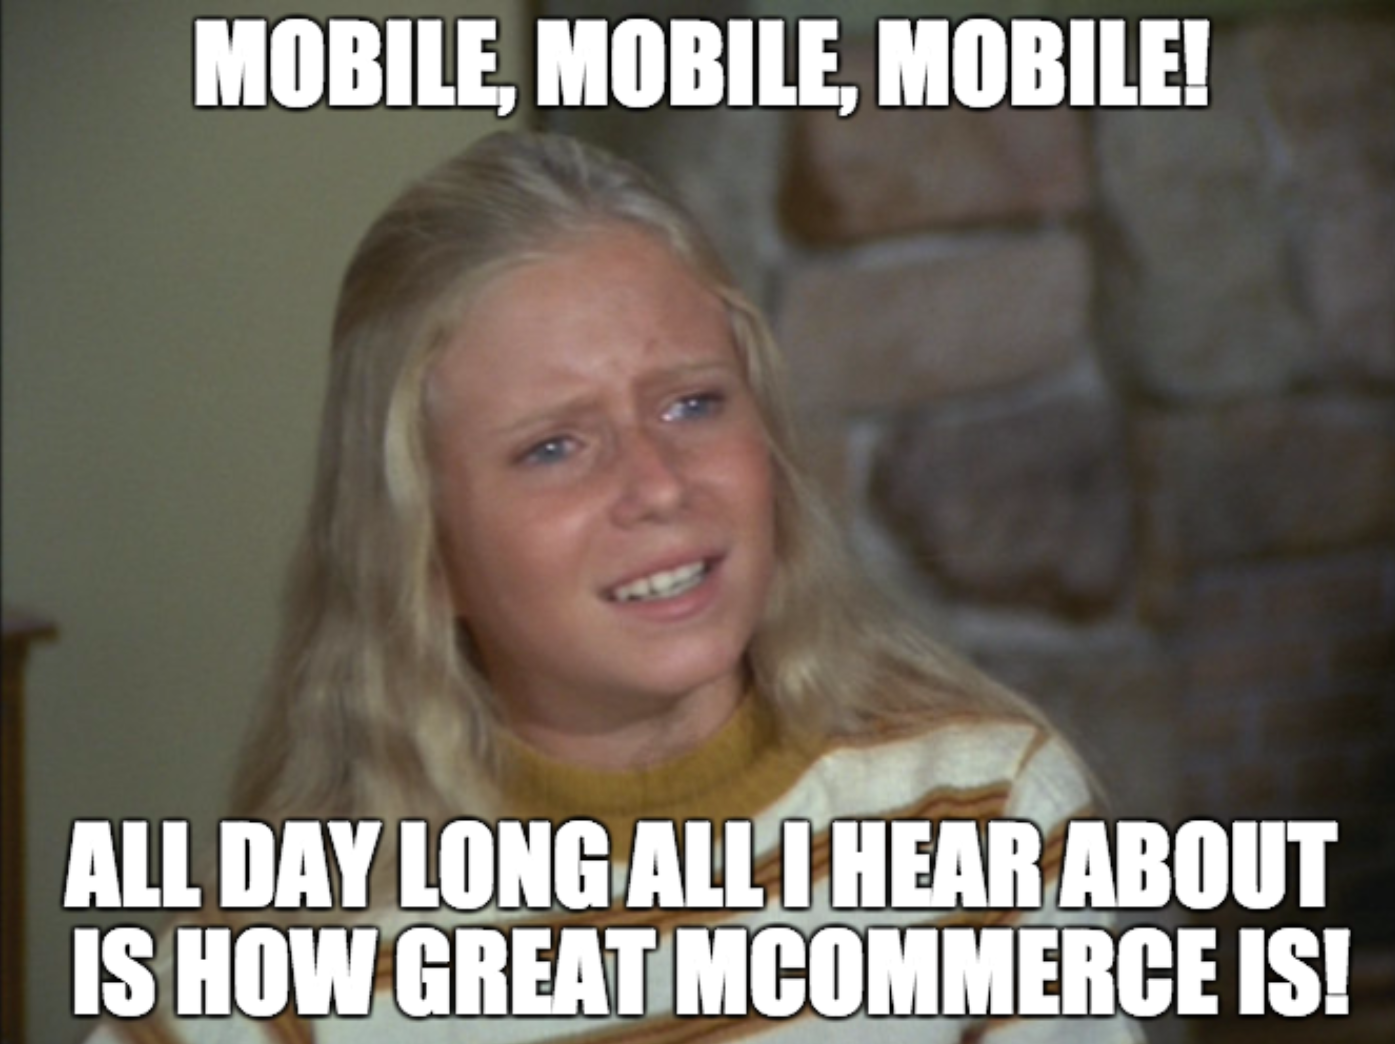 mobile-mobile-mobile-brady-bunch-meme-2